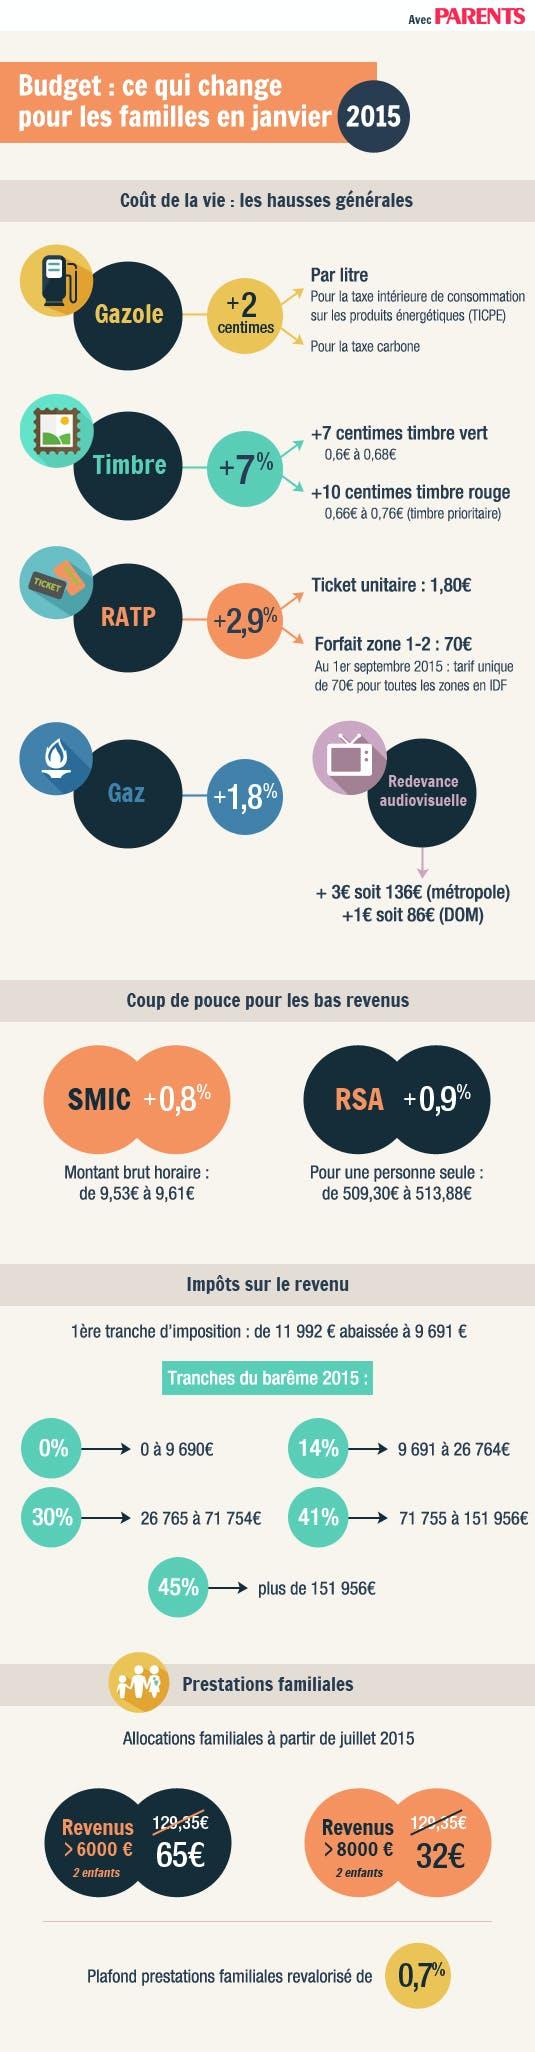 infographie du budget 2015